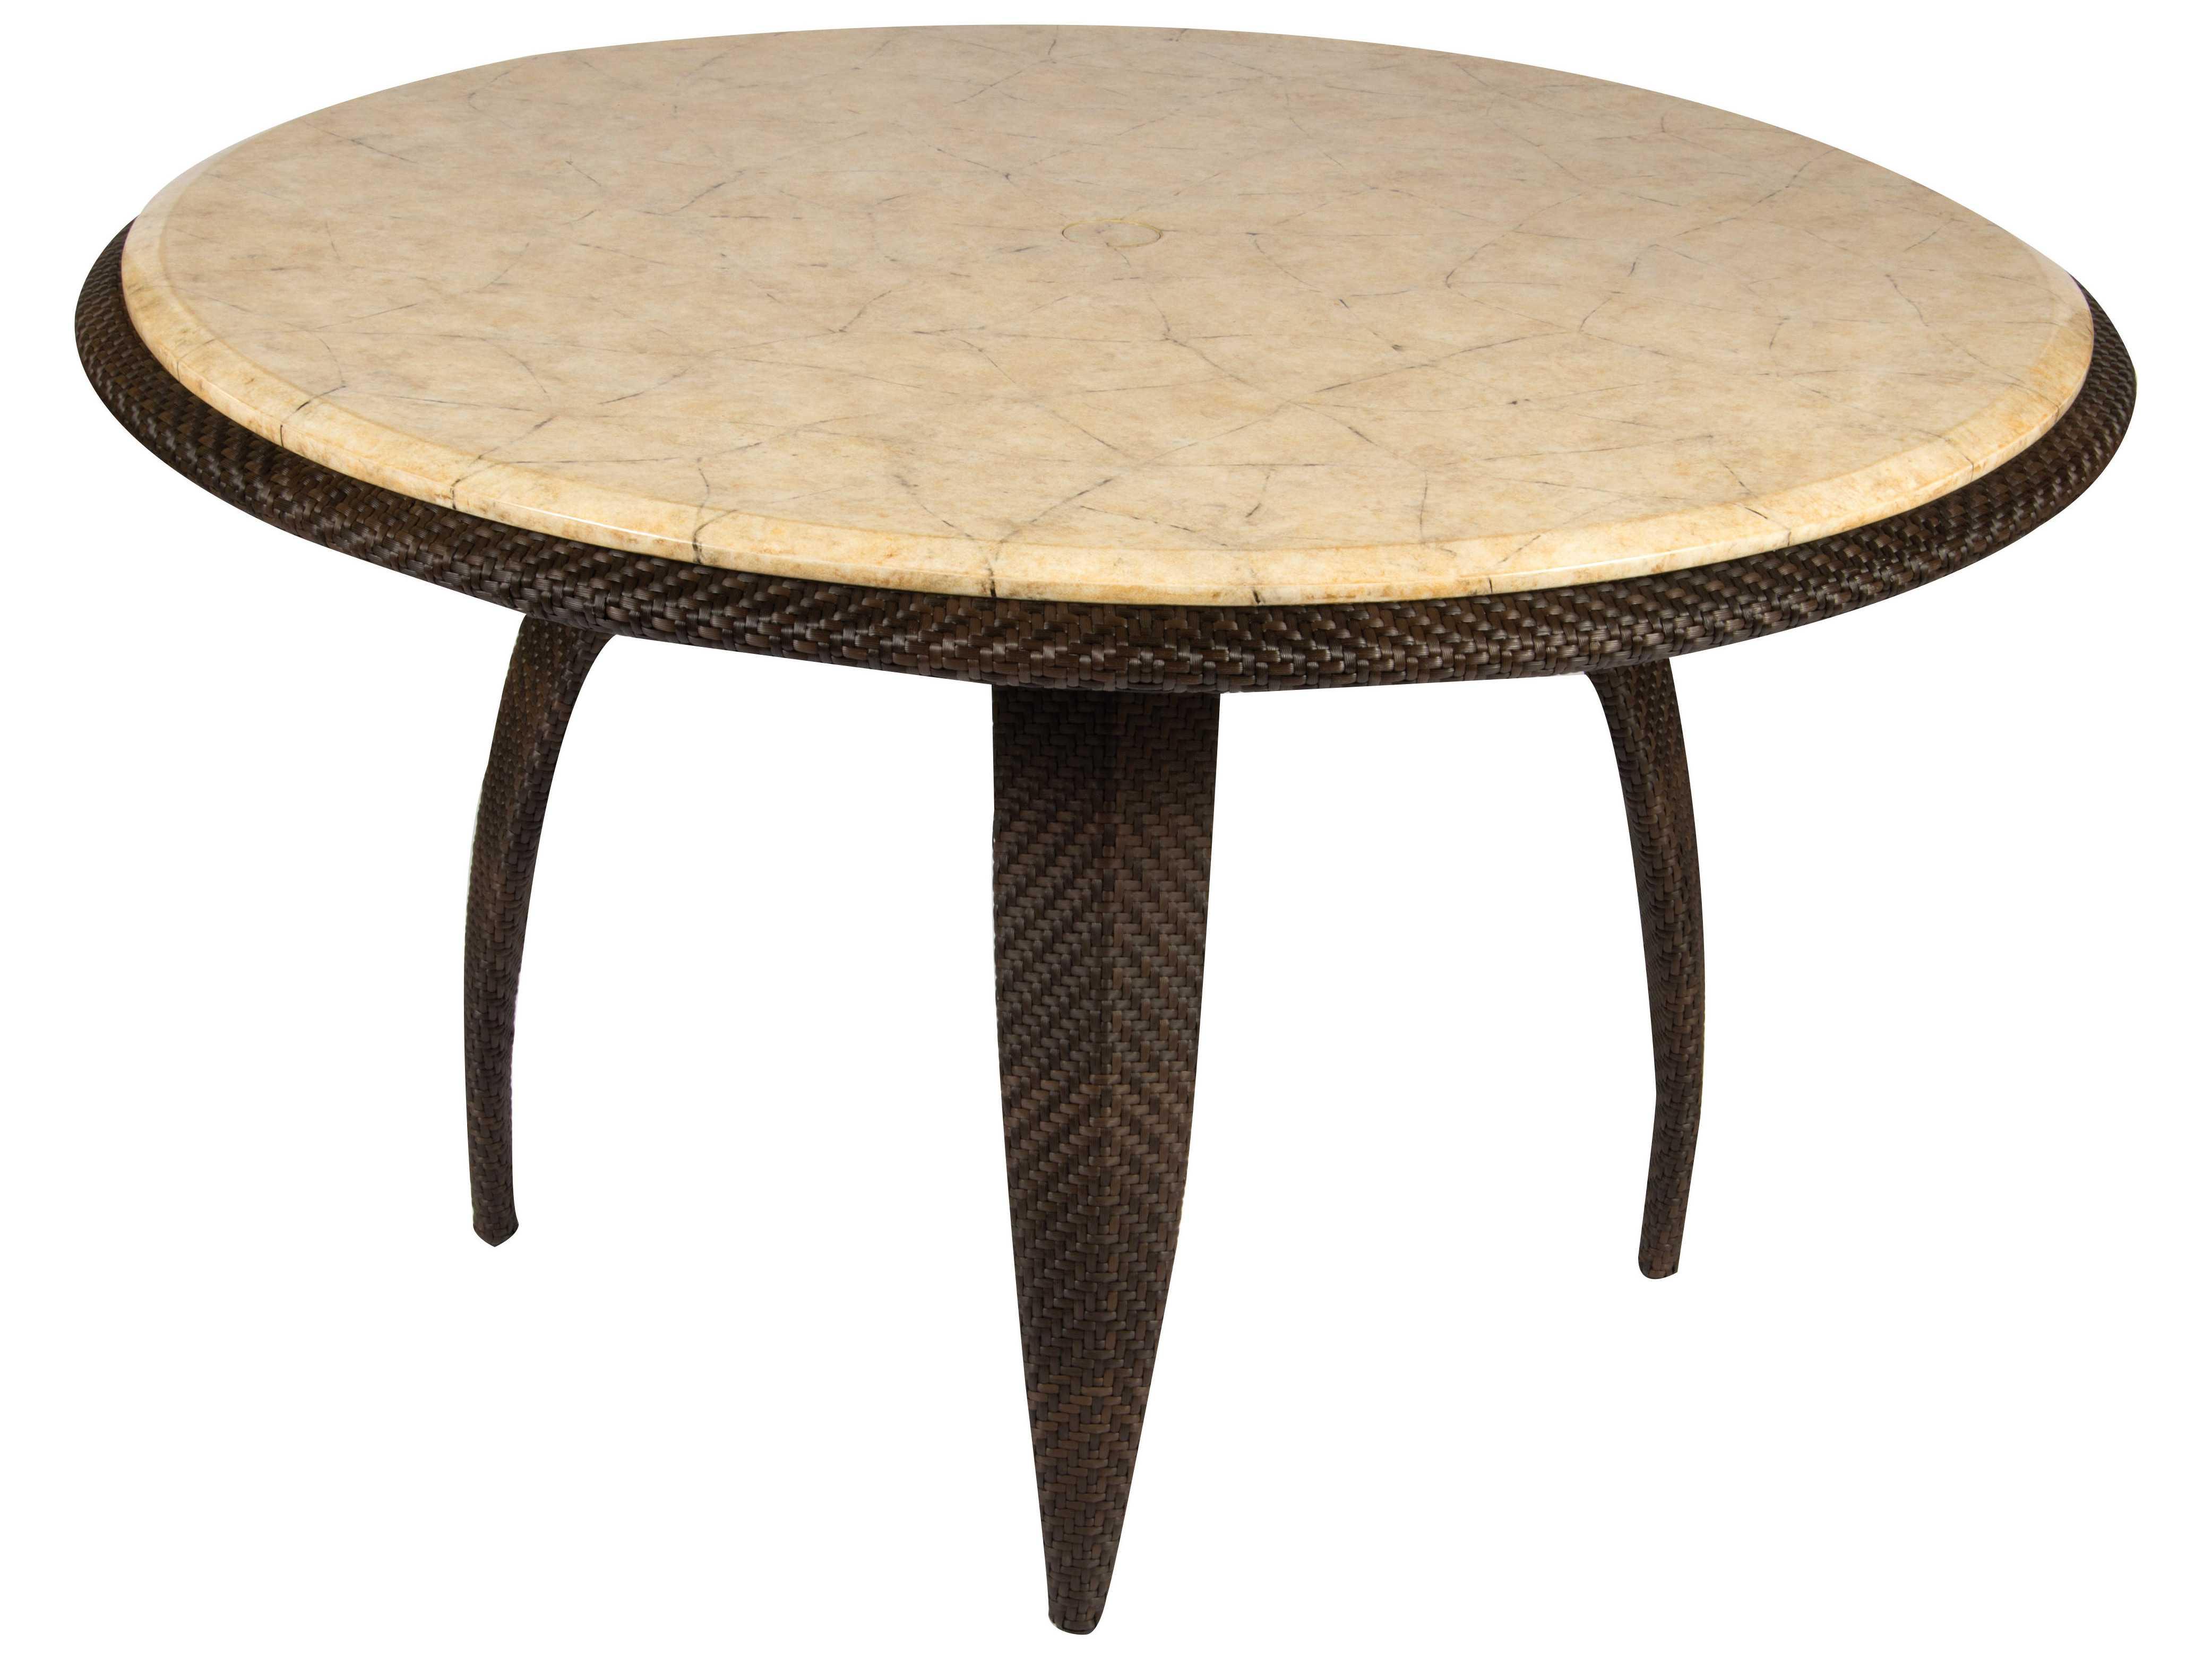 Whitecraft bali wicker 48 round stone top dining table for Round stone top dining table